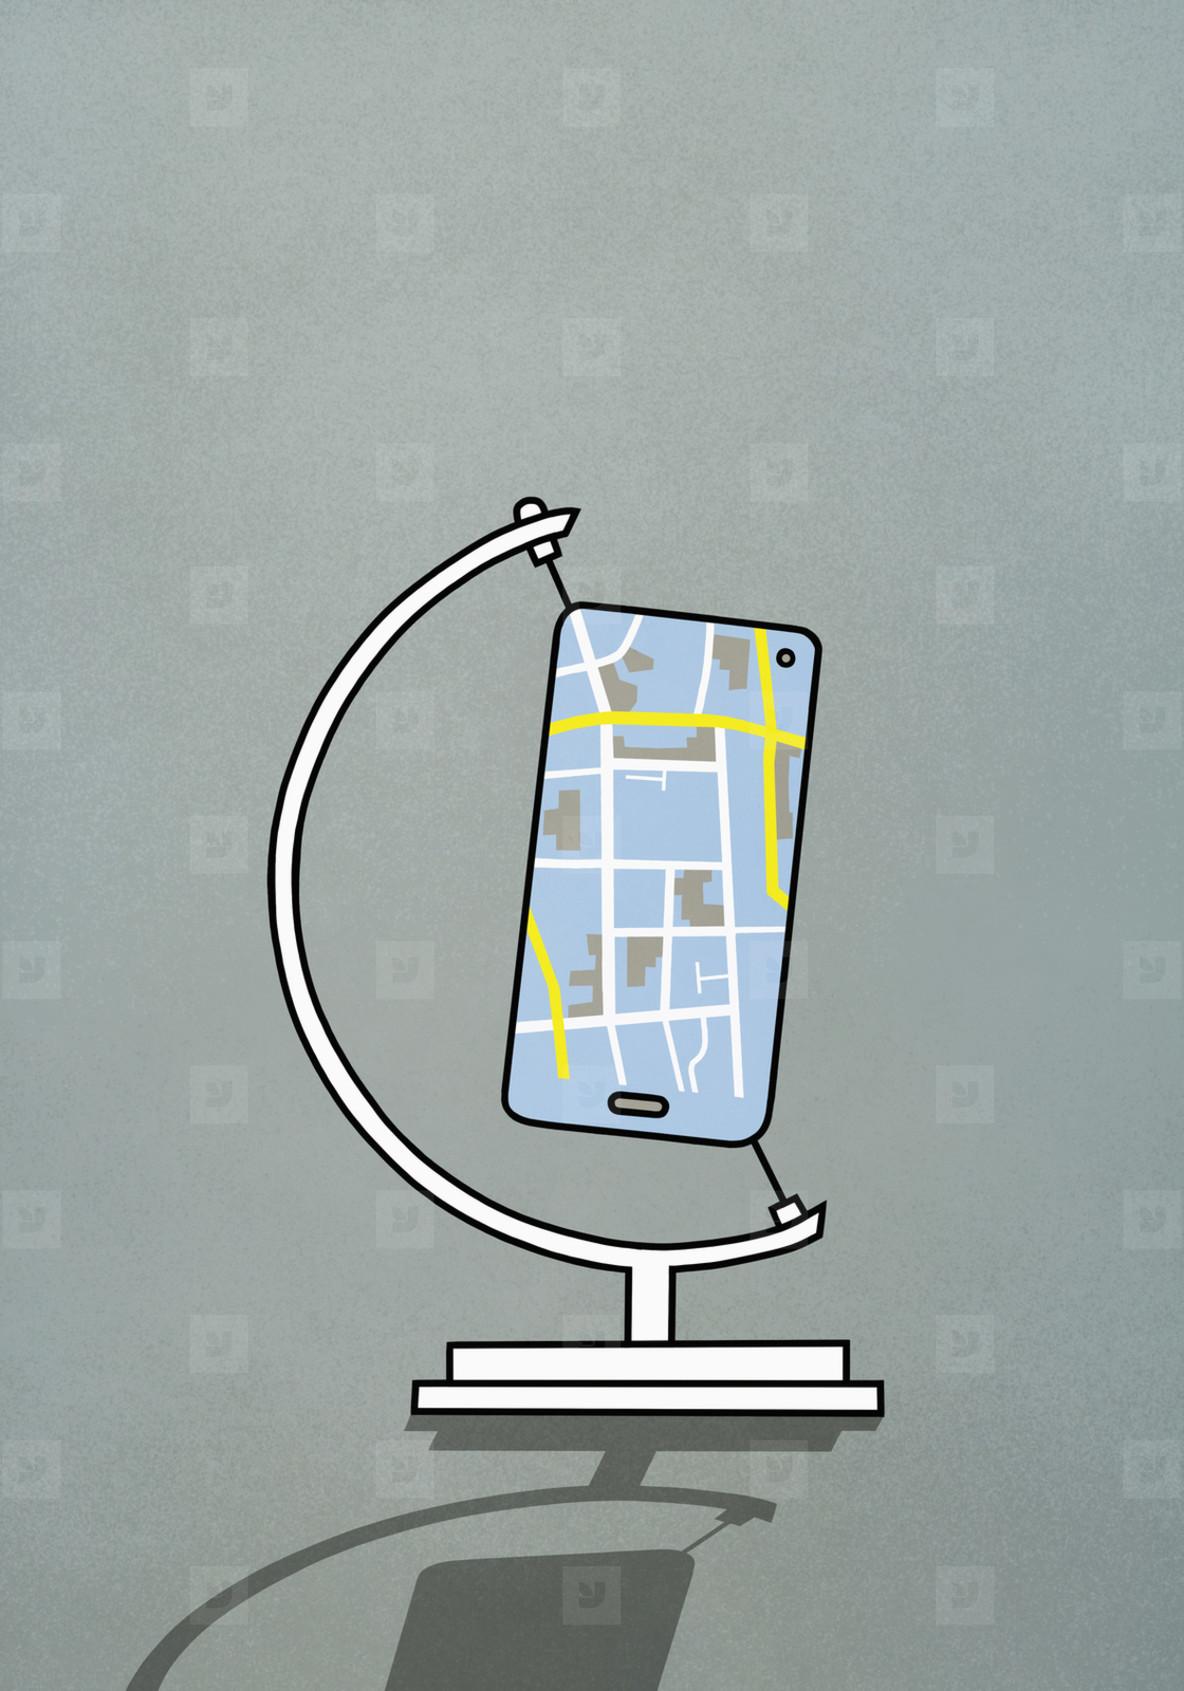 GPS on smart phone screen in globe stand